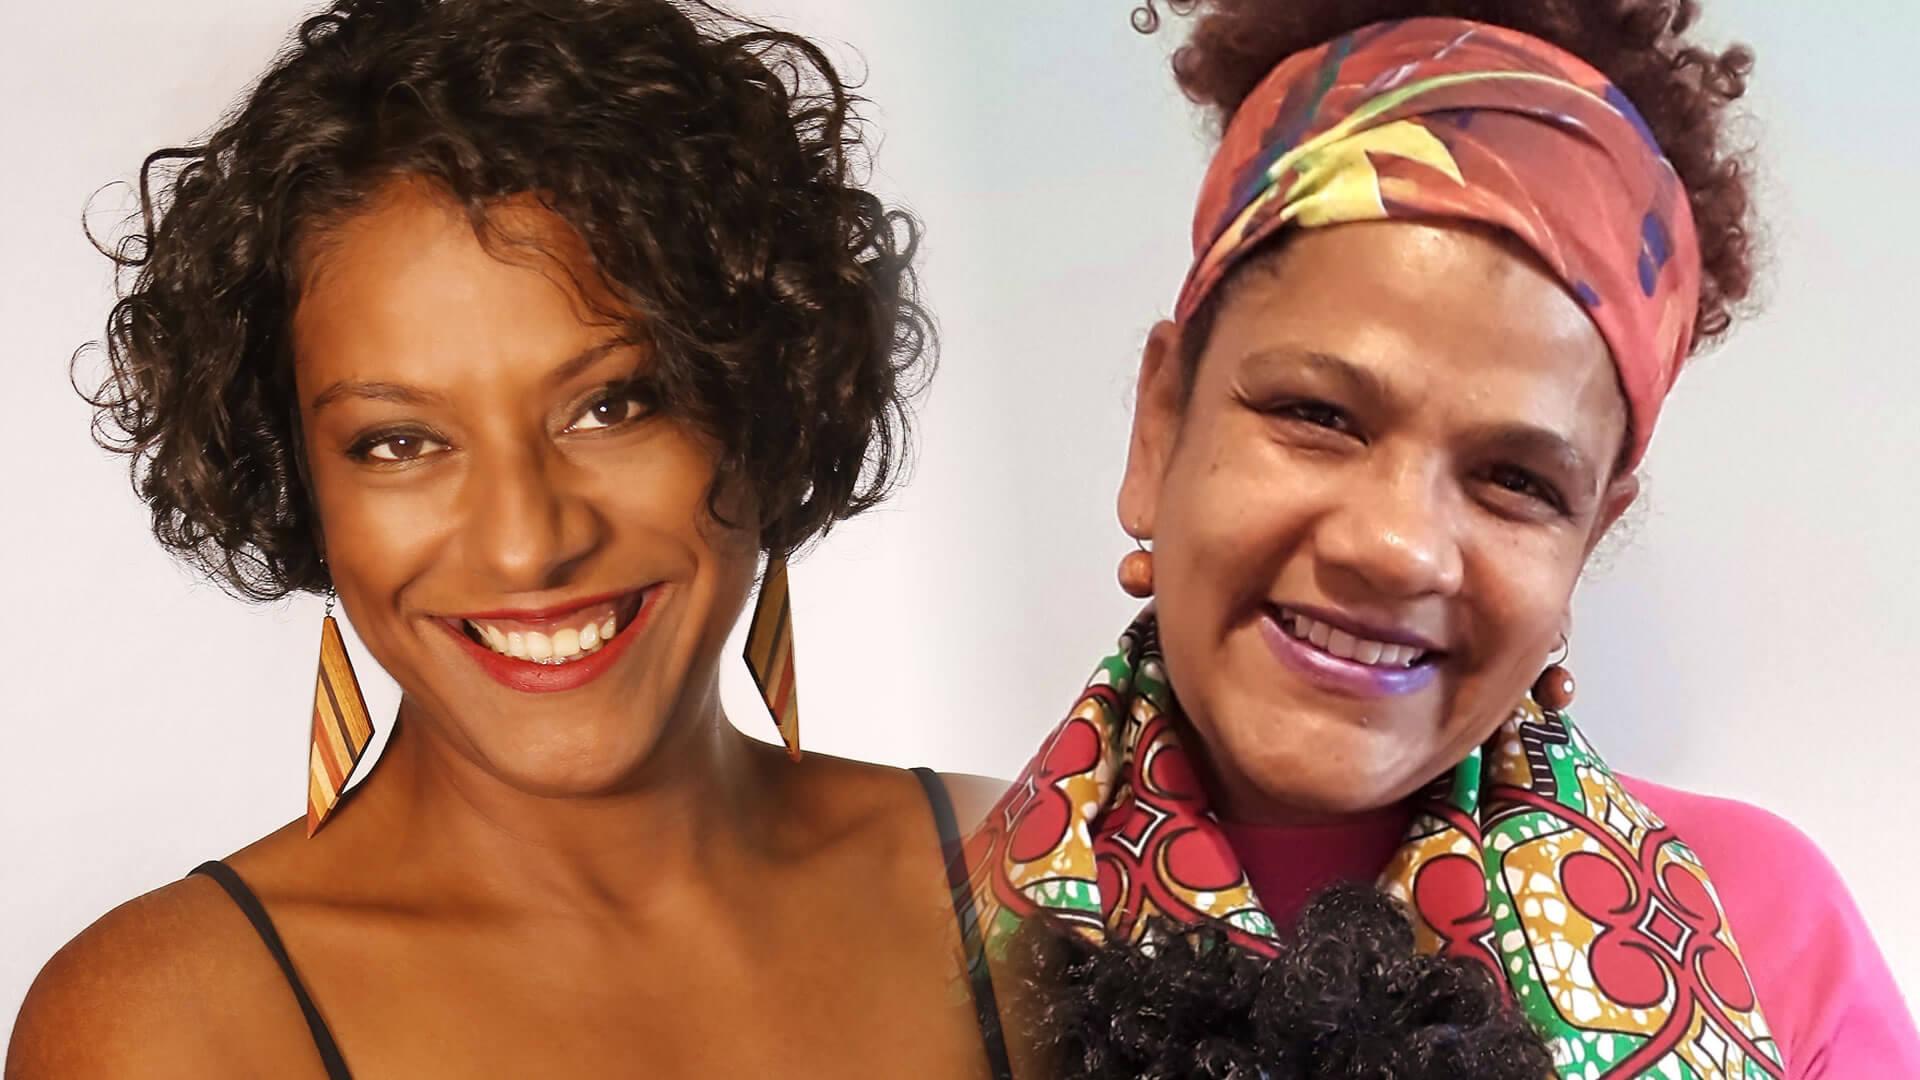 Mulheres que Leem Mulheres: Waleska Barbosa recebe Lucimar Rosa Dias